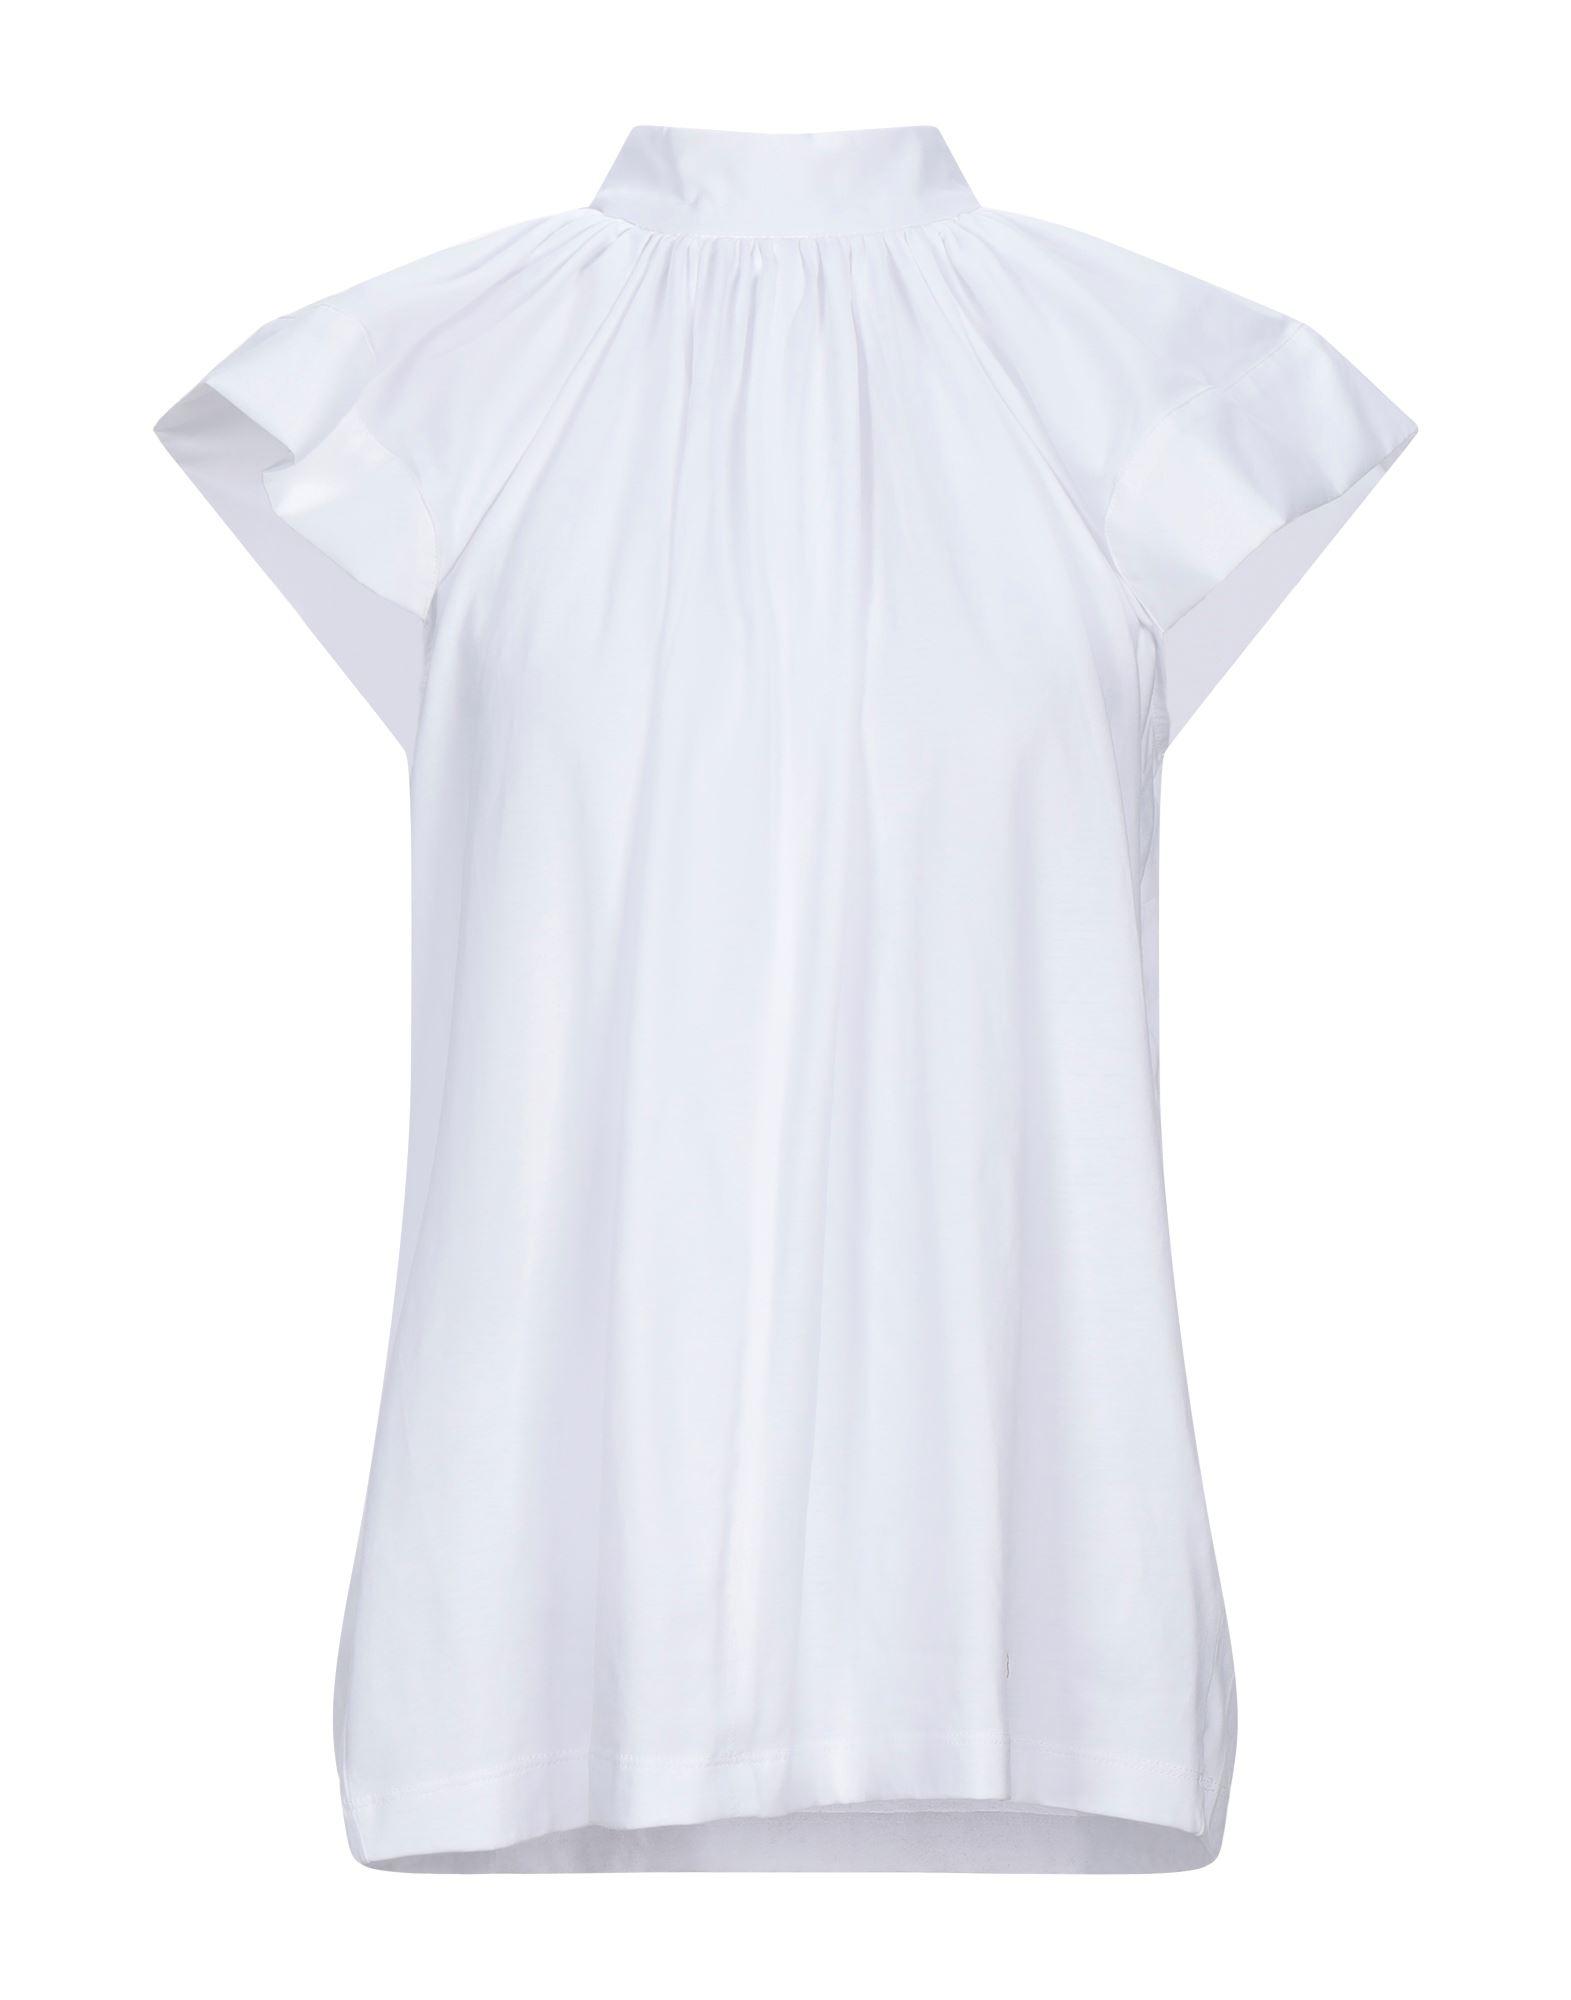 VICTORIA, VICTORIA BECKHAM T-shirts - Item 12564802